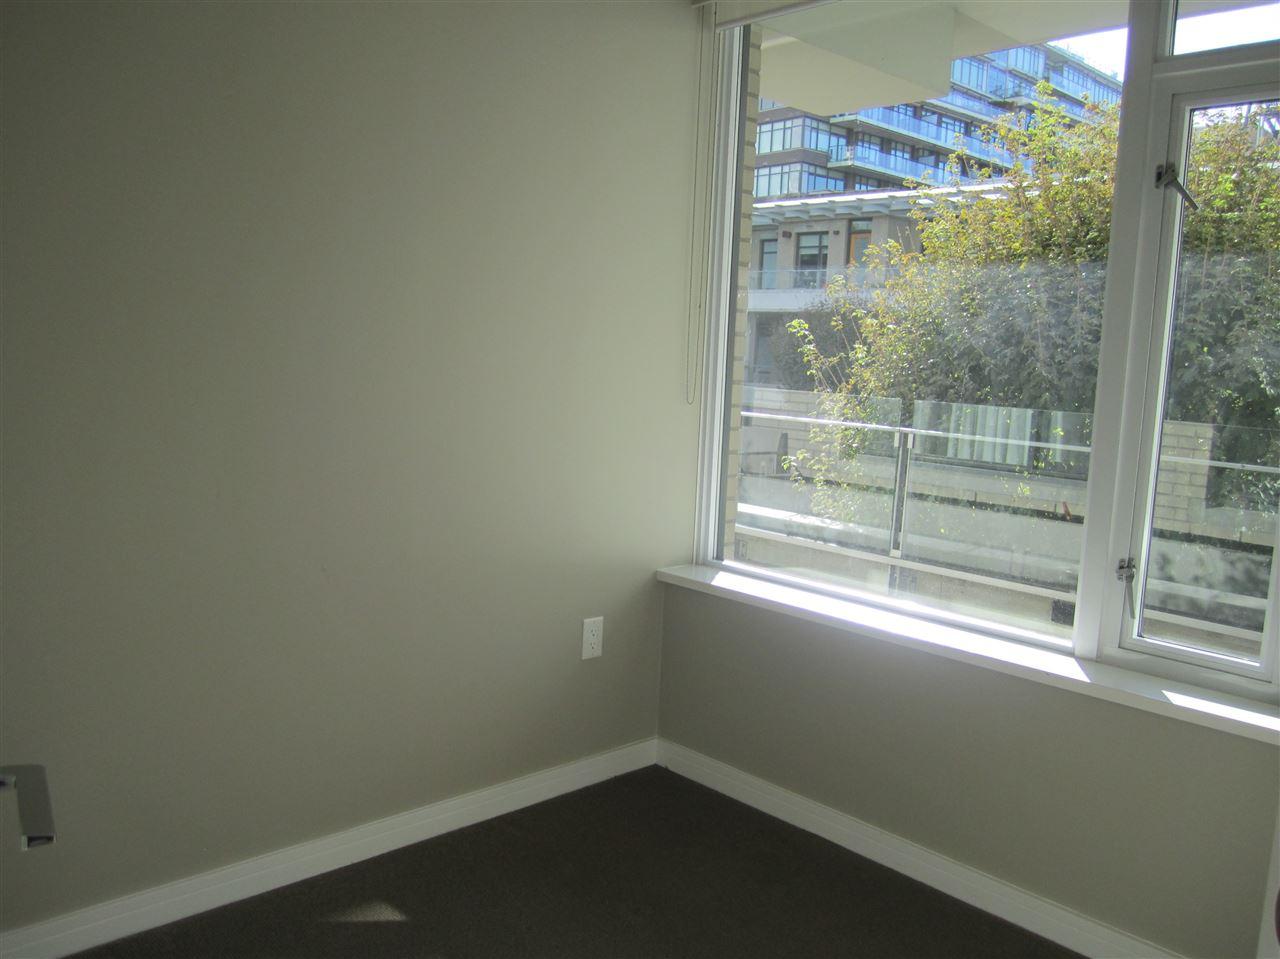 Condo Apartment at 405 12 ATHLETES WAY, Unit 405, Vancouver West, British Columbia. Image 6